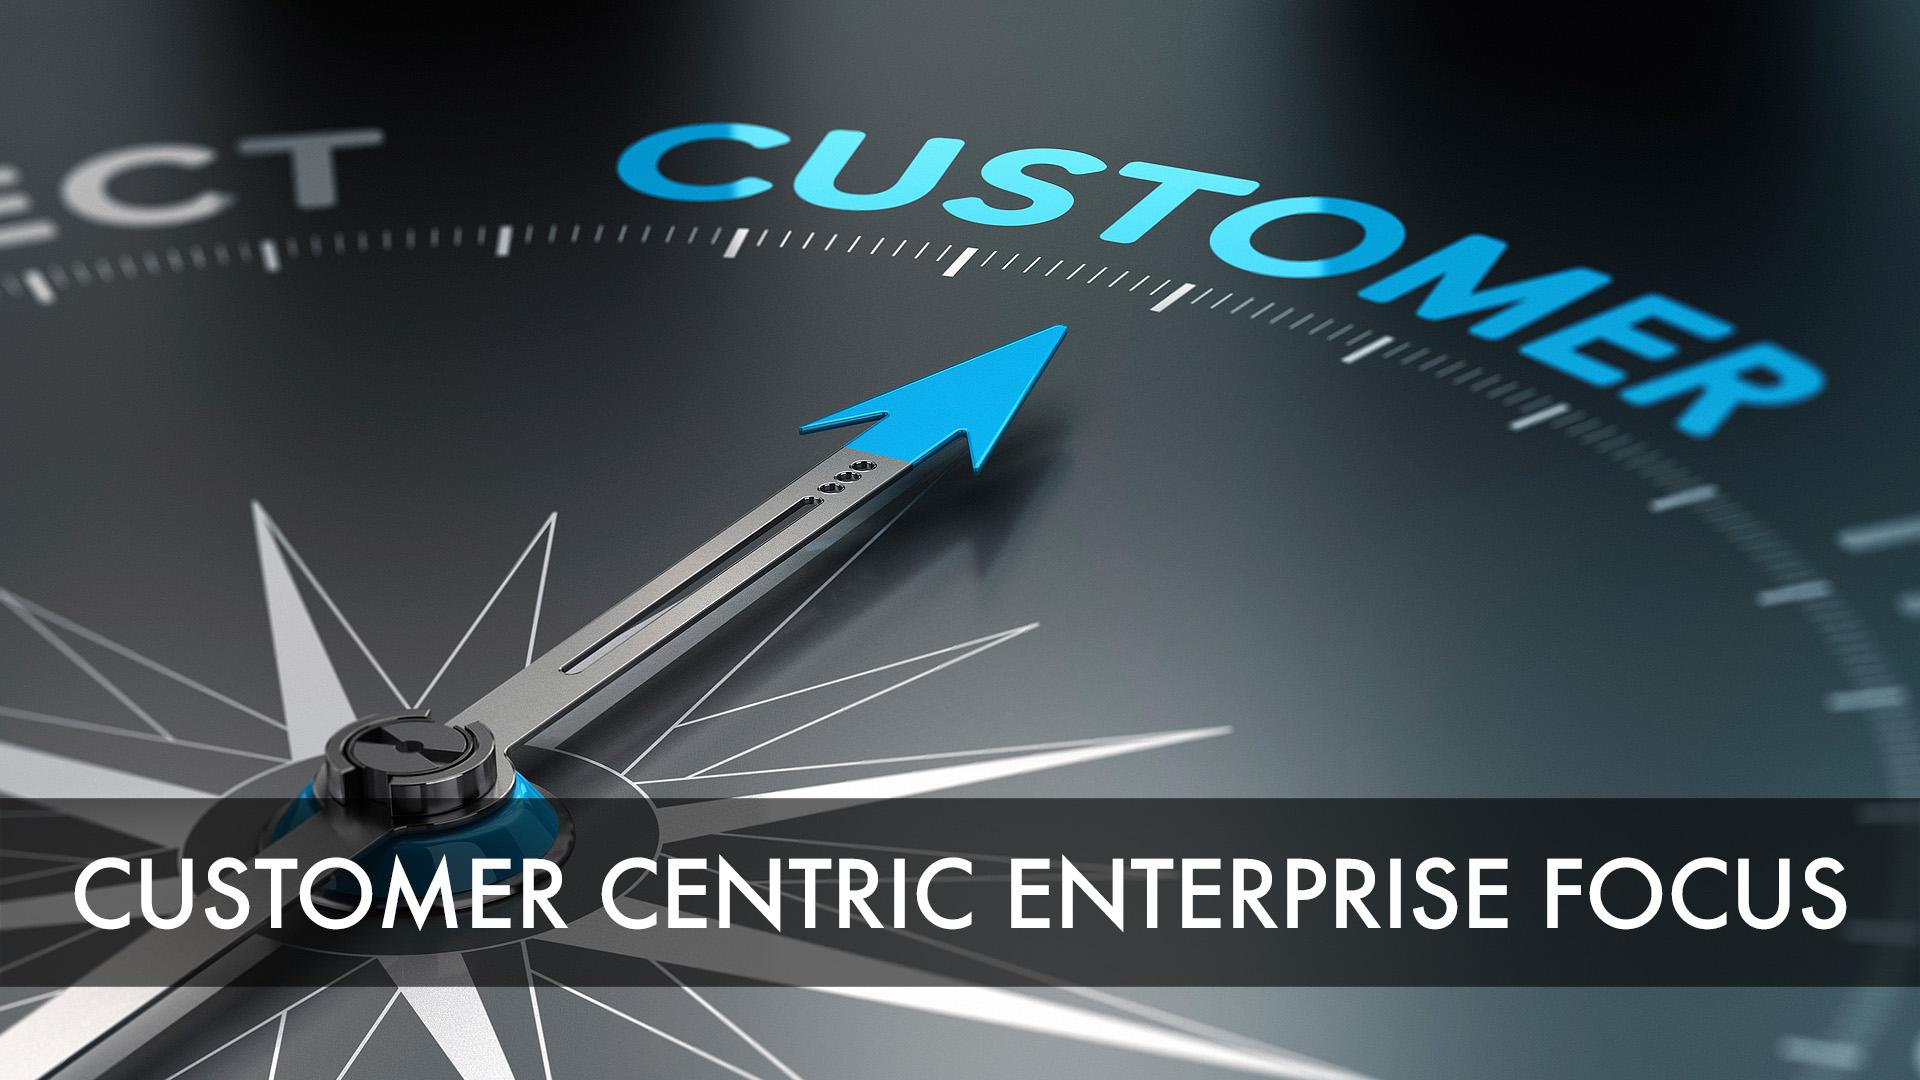 Customer Centric Focus Thumbnail.jpg